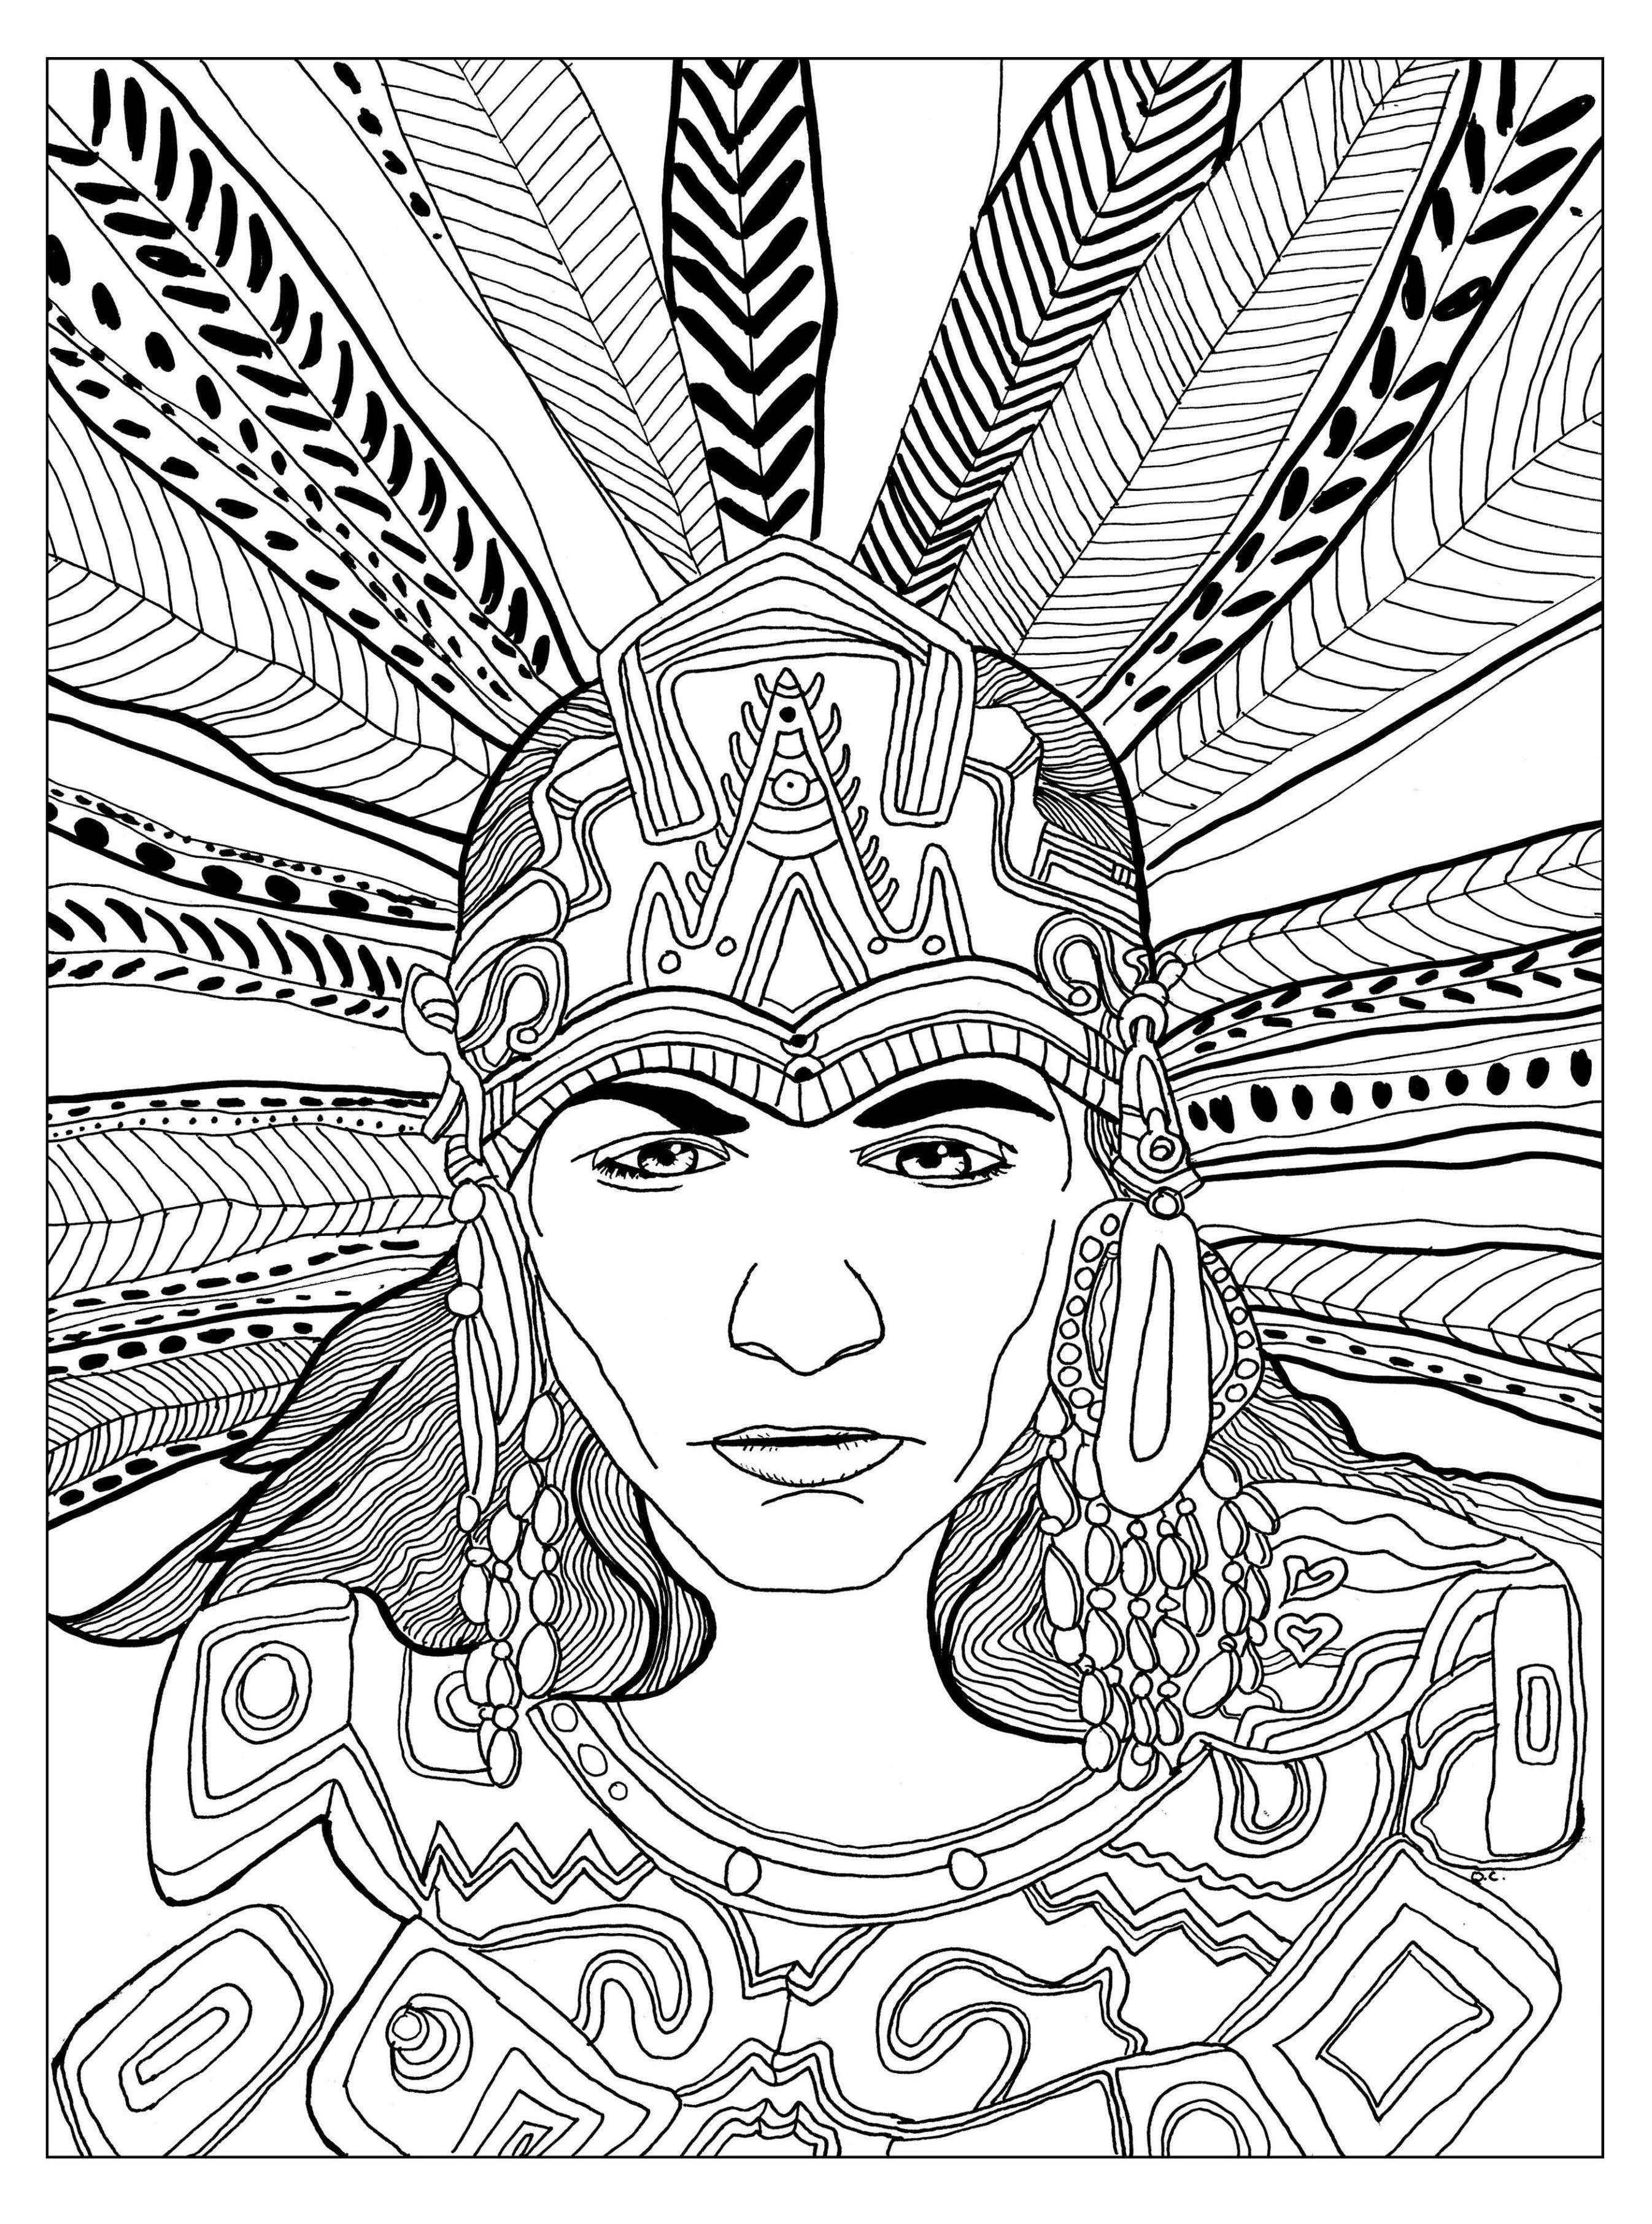 mayan coloring pages Chief mayan   Olivier   Coloring Pages for Adults mayan coloring pages